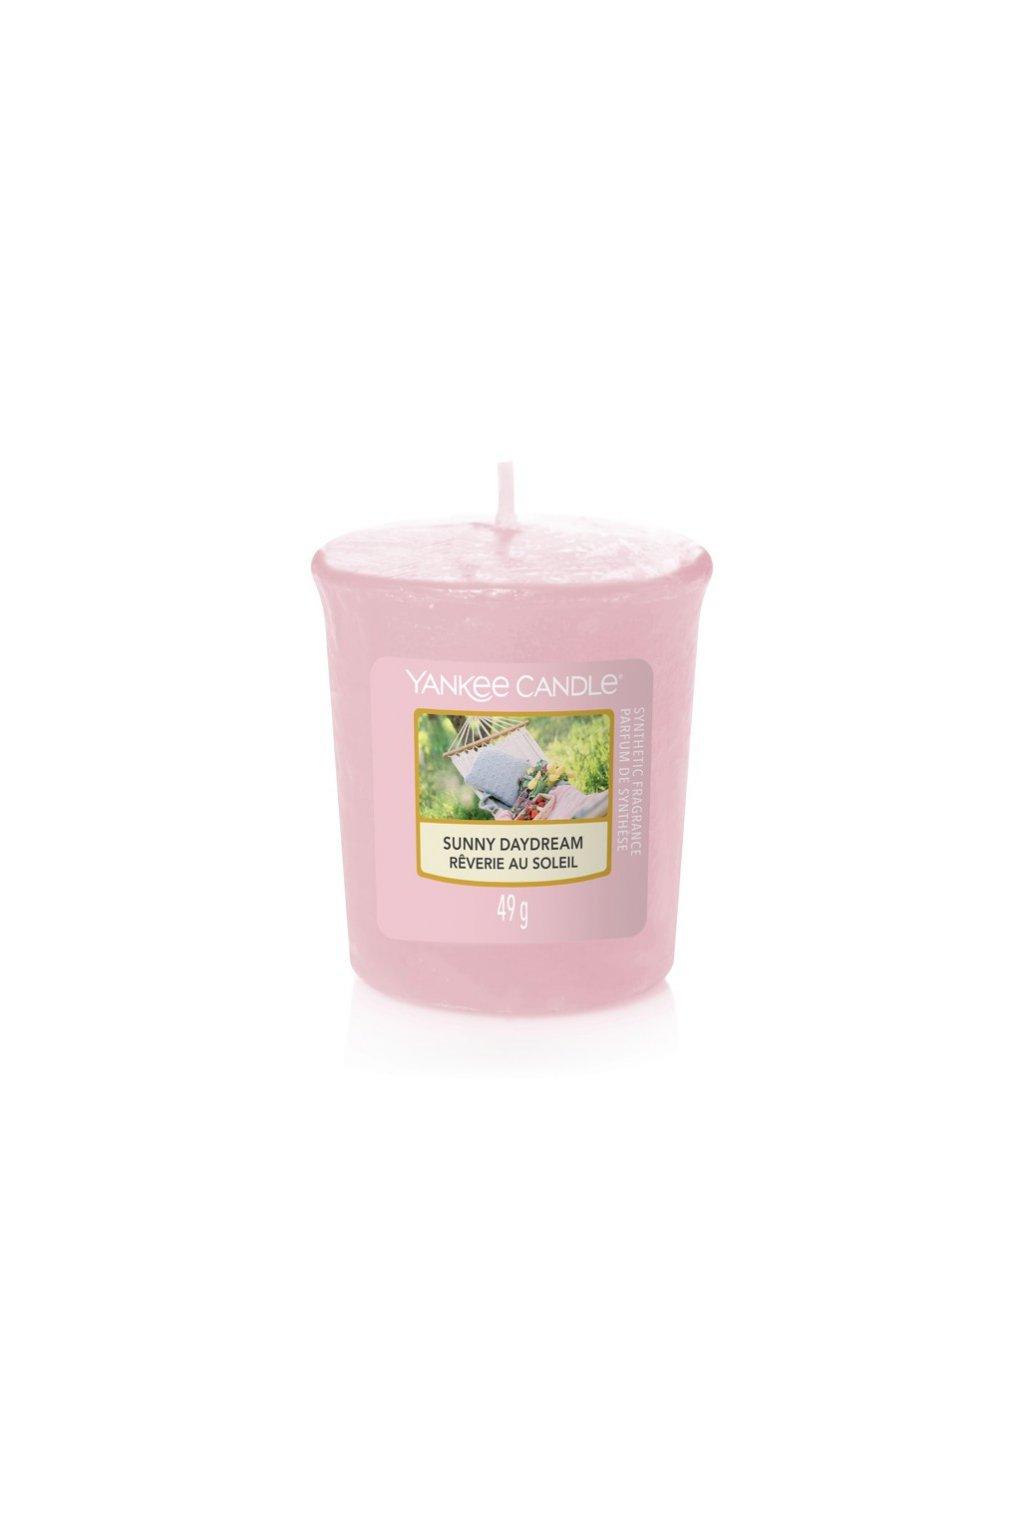 Yankee Candle Sunny Daydream 49g